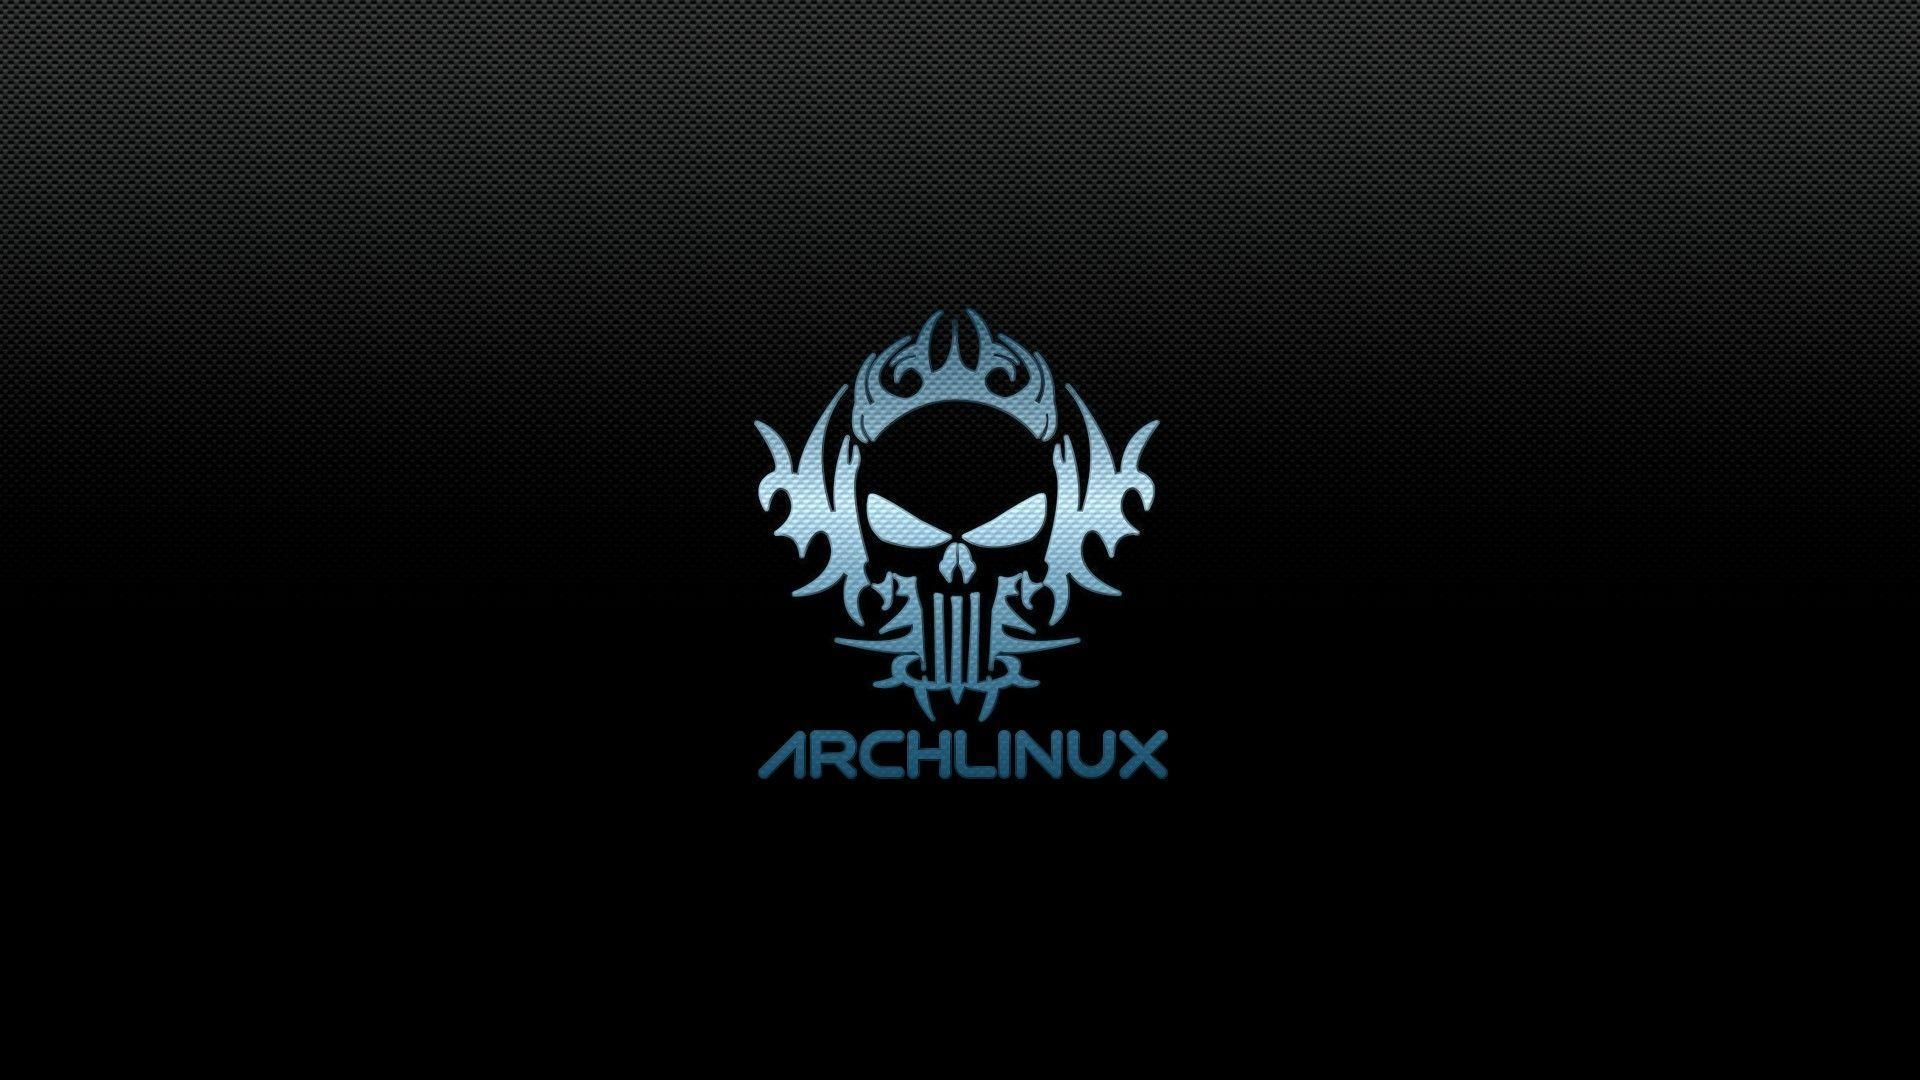 Arch 1080p